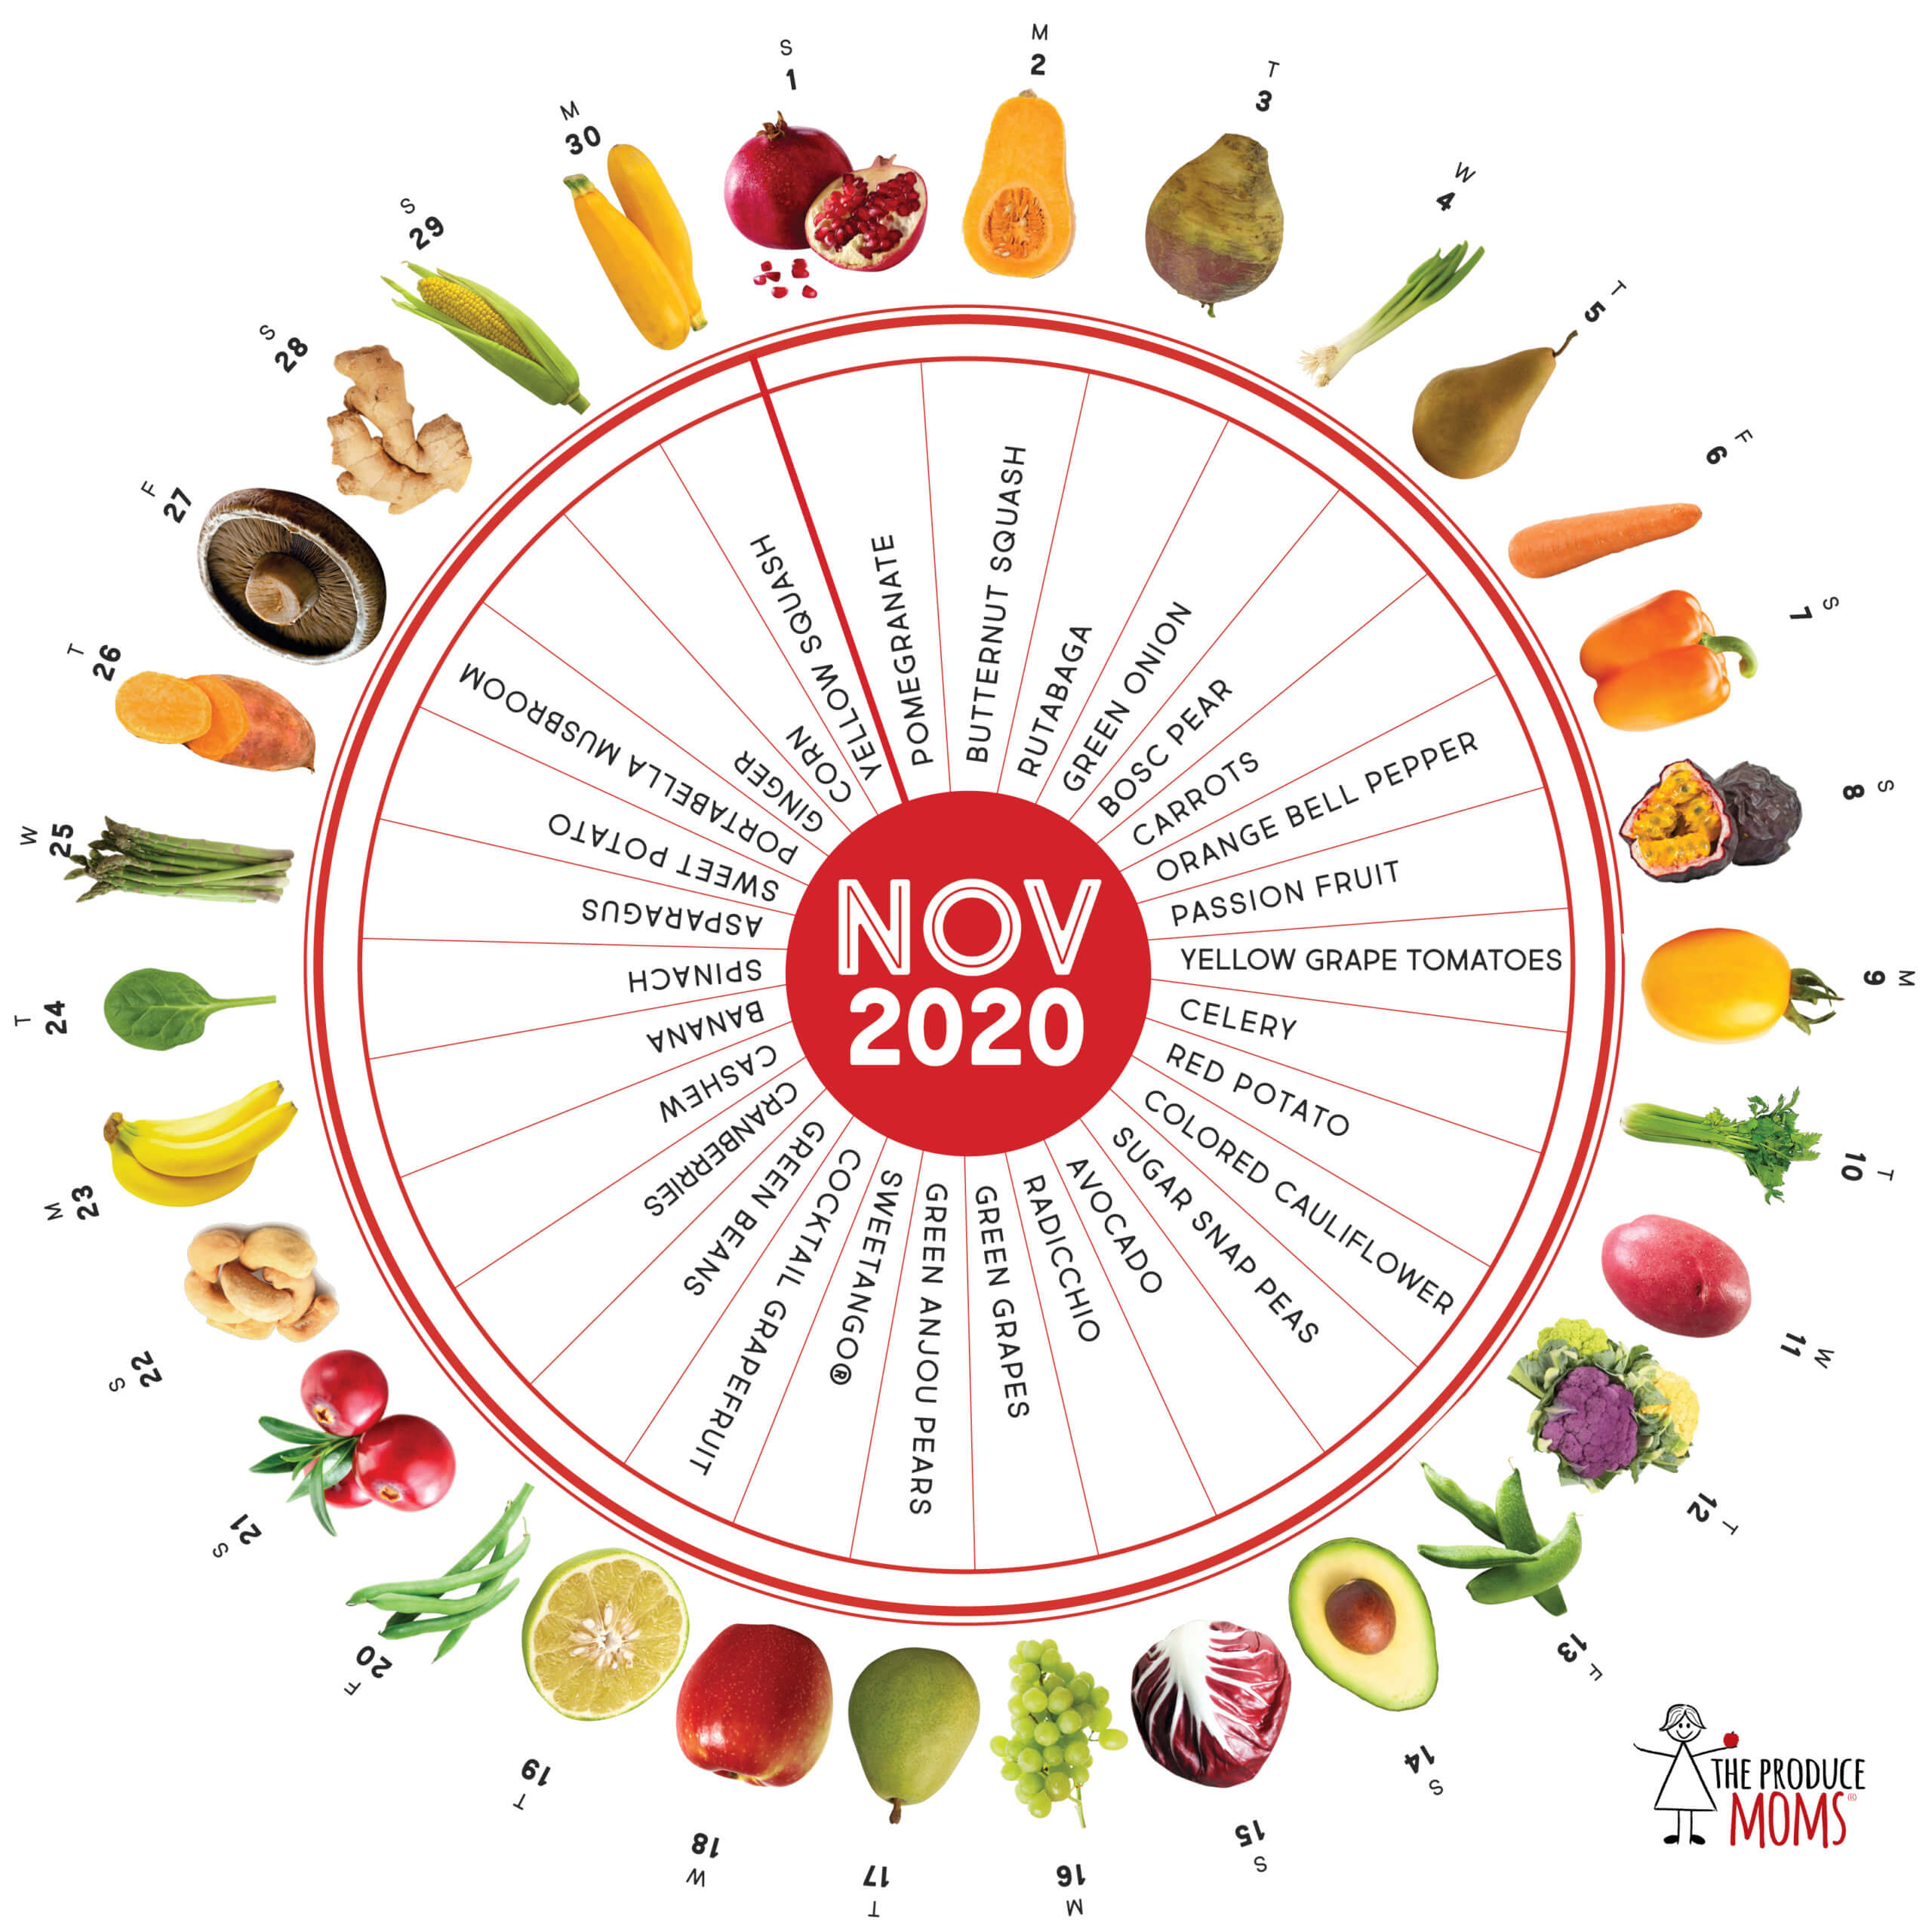 November 2020 Produce Challenge